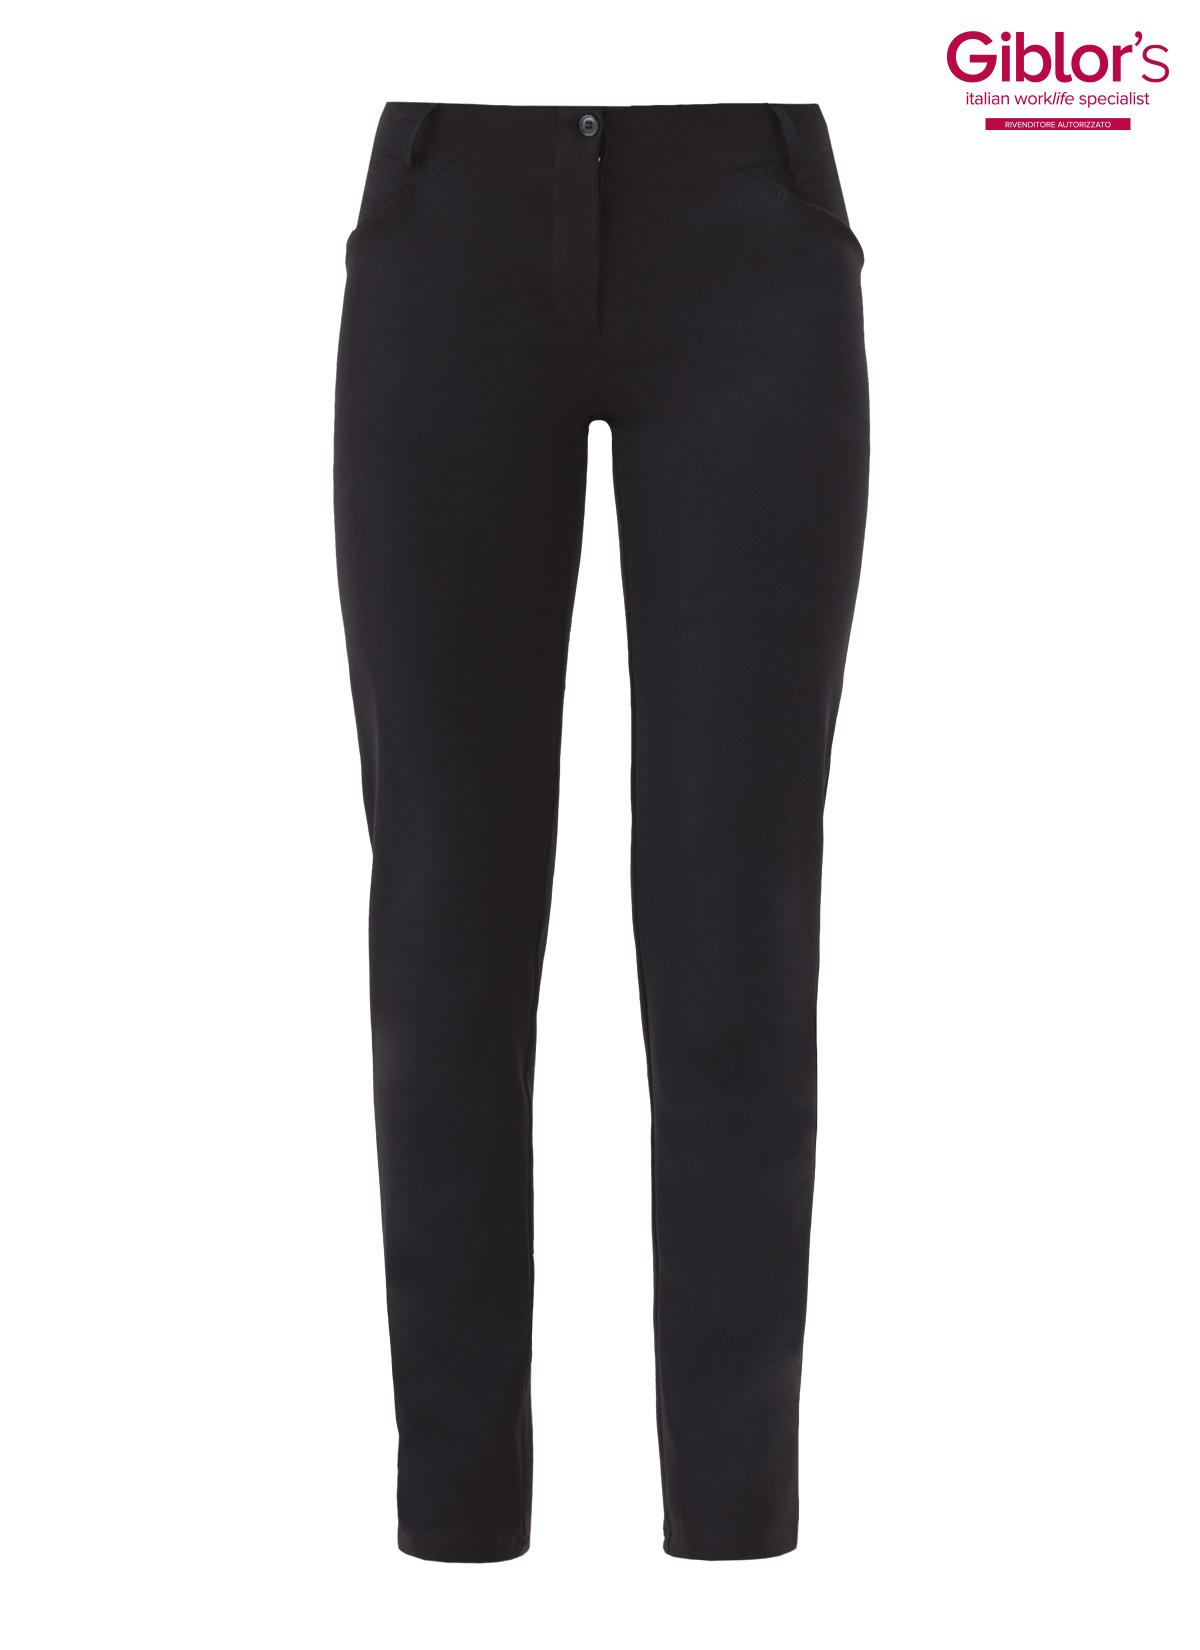 pantaloni donna elasticizz